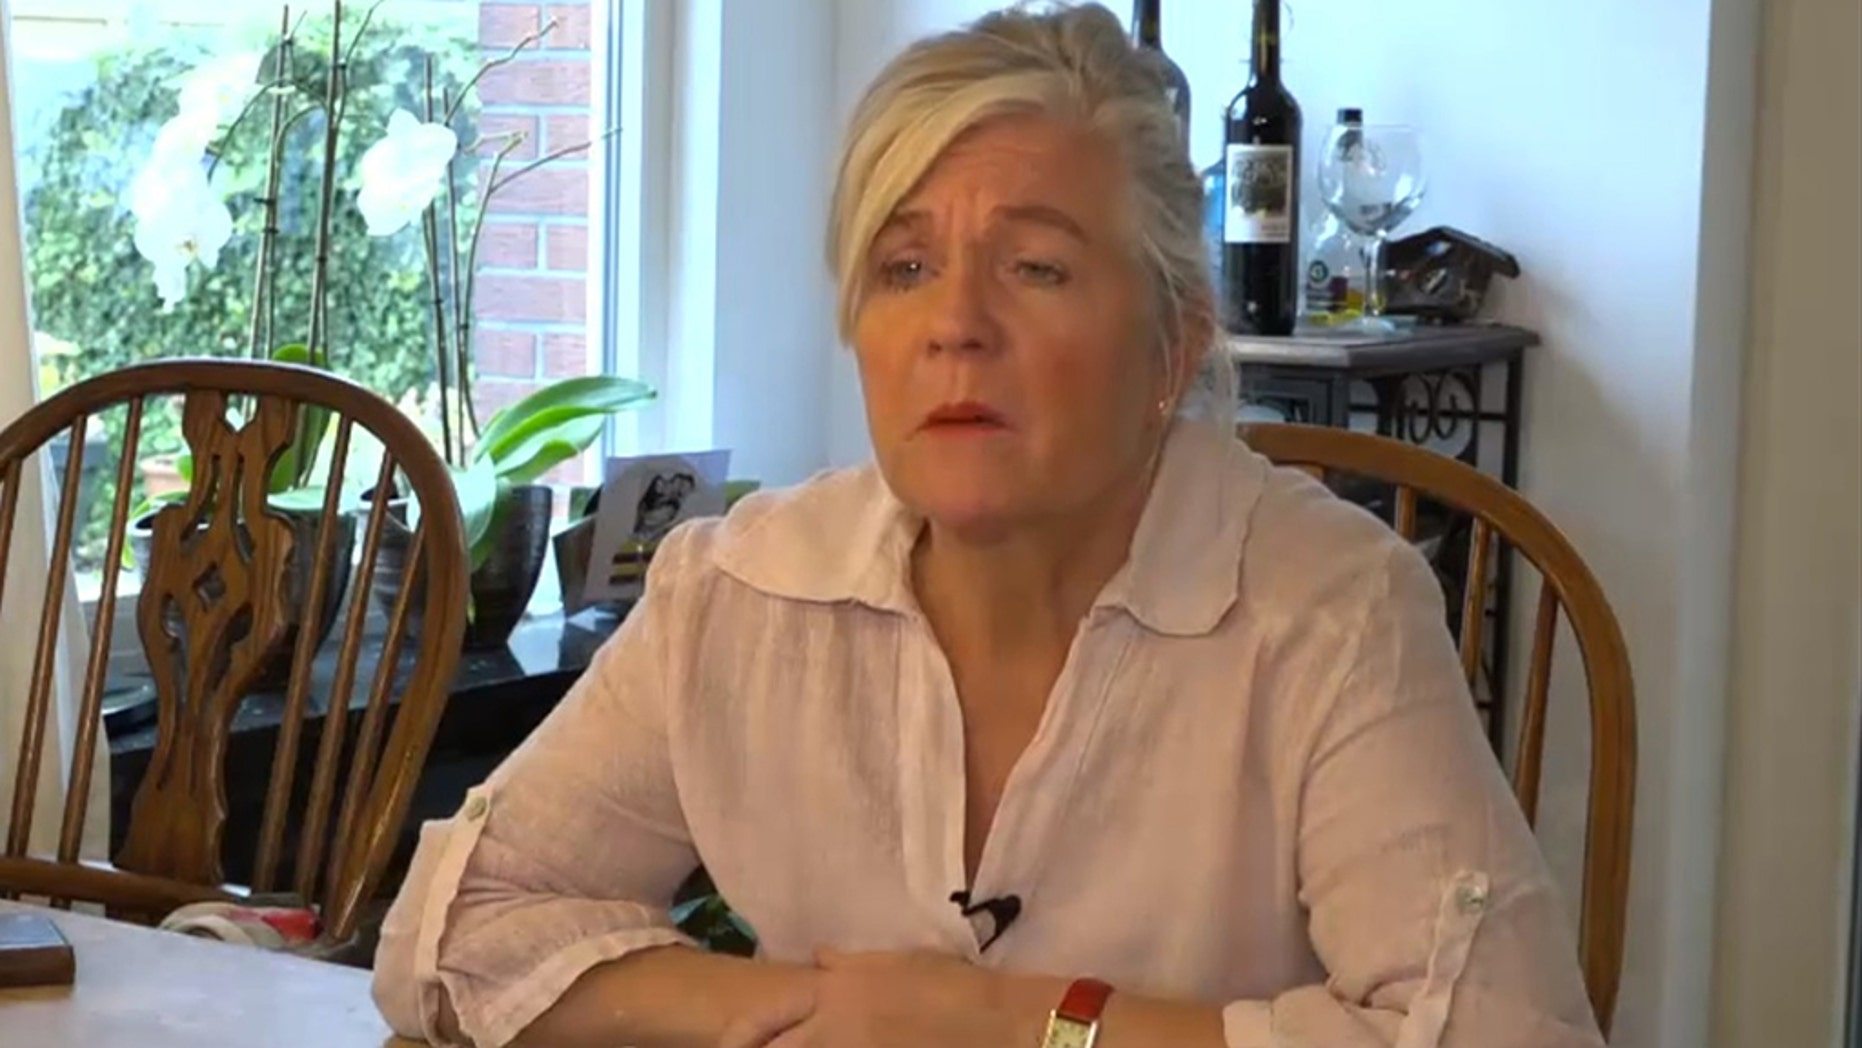 Petra van Kalmthout said she now wears a prosthetic eye.